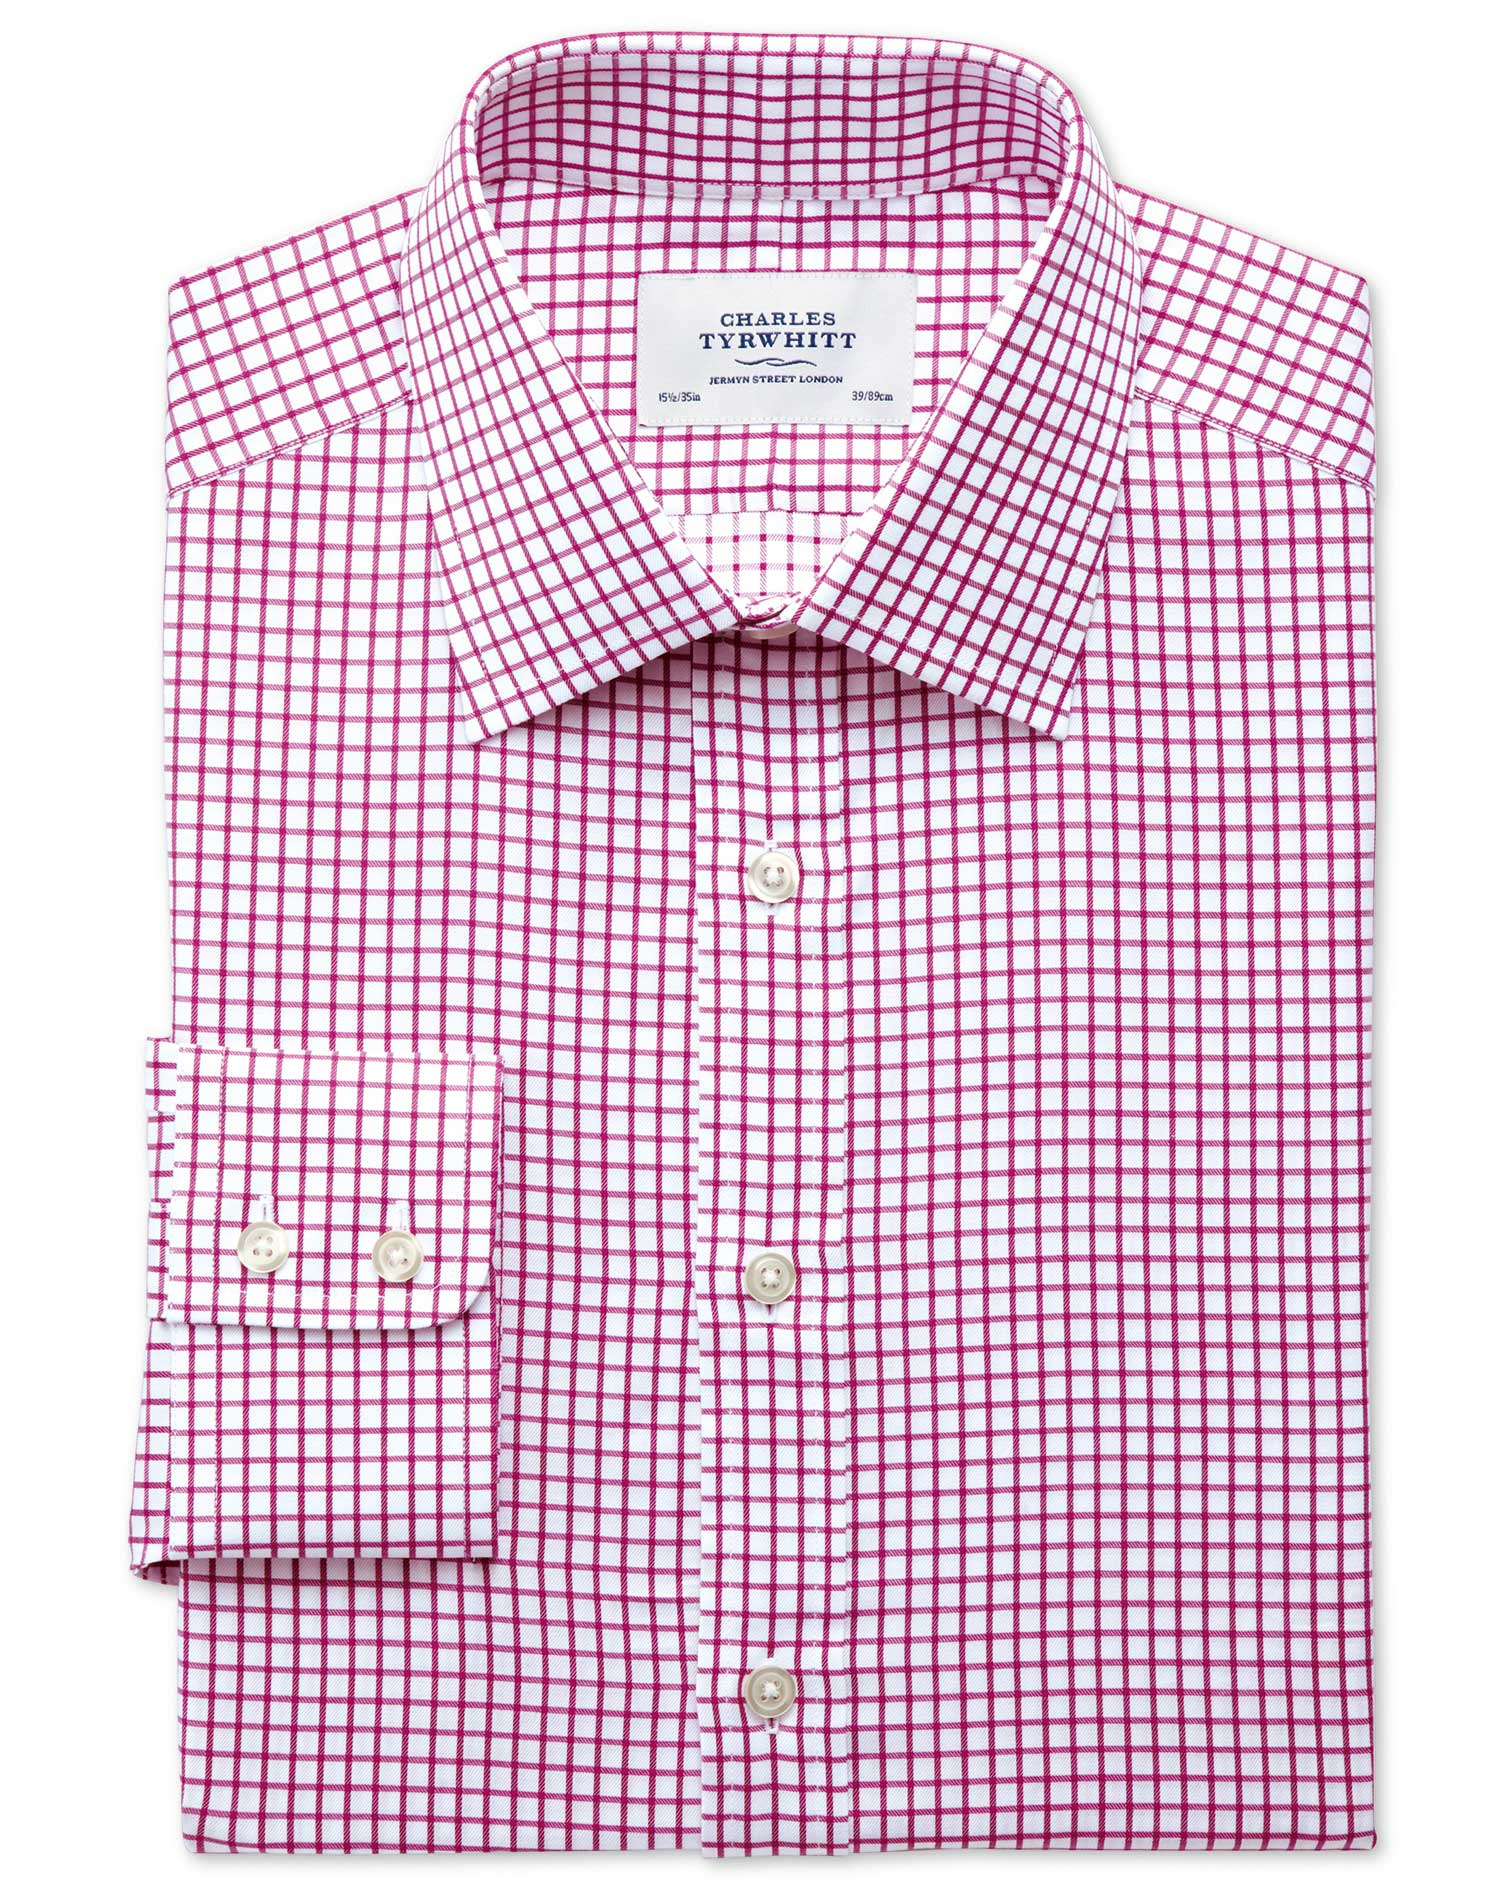 Extra Slim Fit Twill Grid Check Fuchsia Cotton Formal Shirt Single Cuff Size 15.5/33 by Charles Tyrw